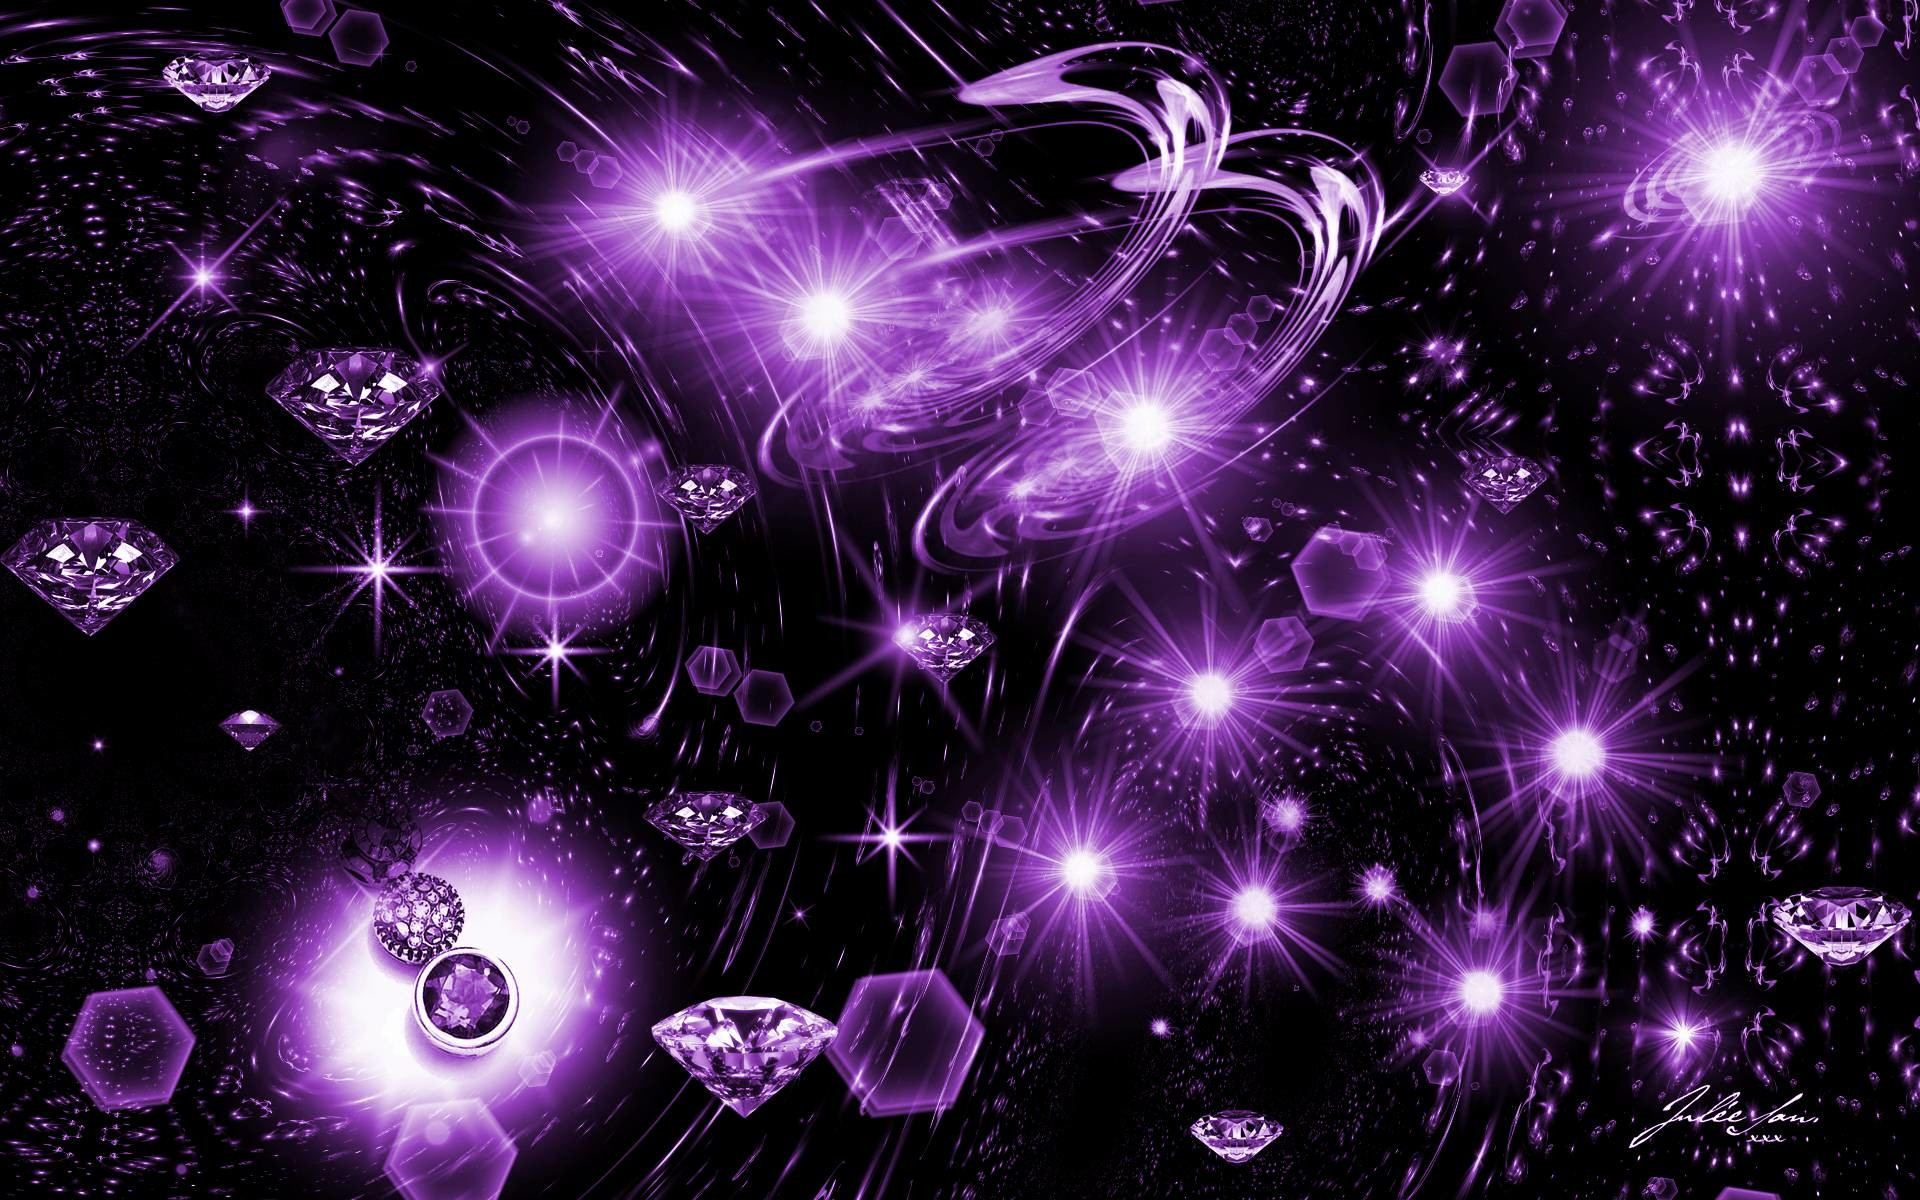 Starry Night Wallpaper – Purple And Black – New by JSSanDA on .